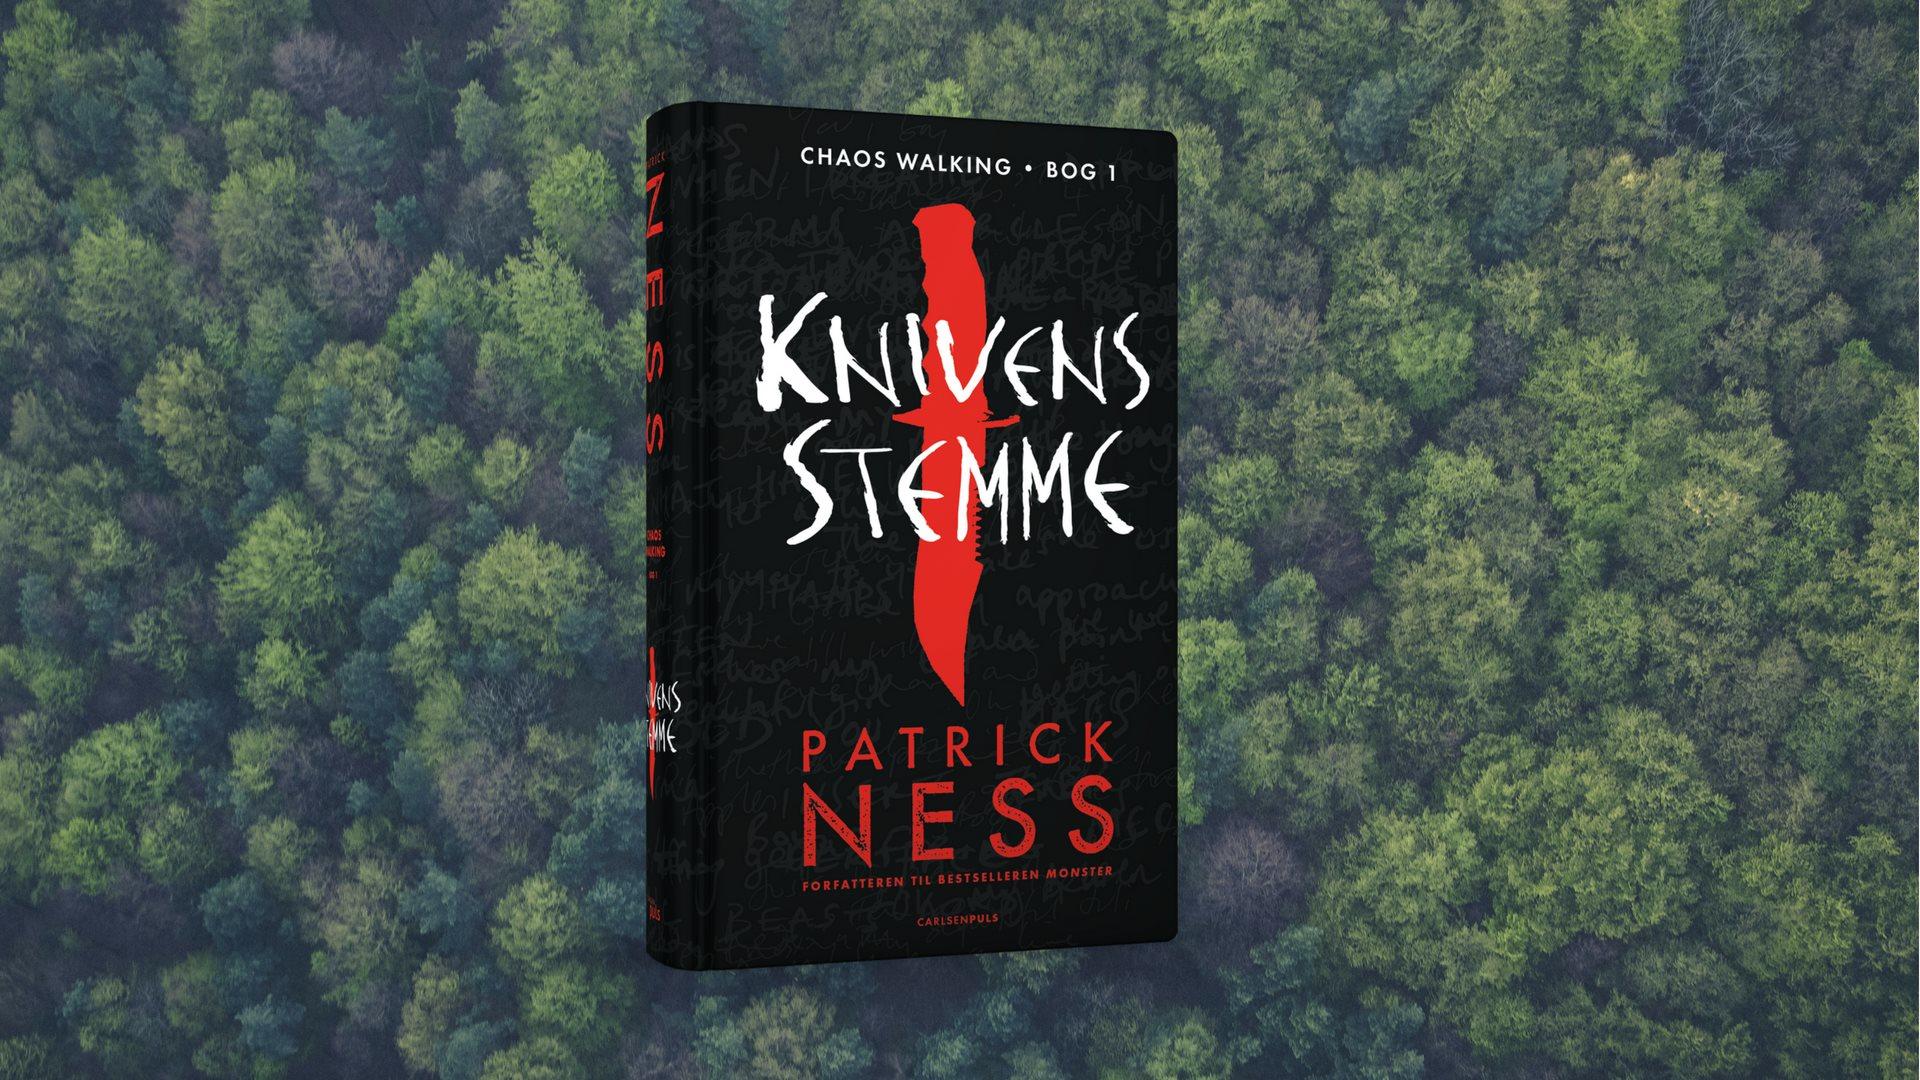 Knivens stemme, Patrick Ness, Chaos Walking